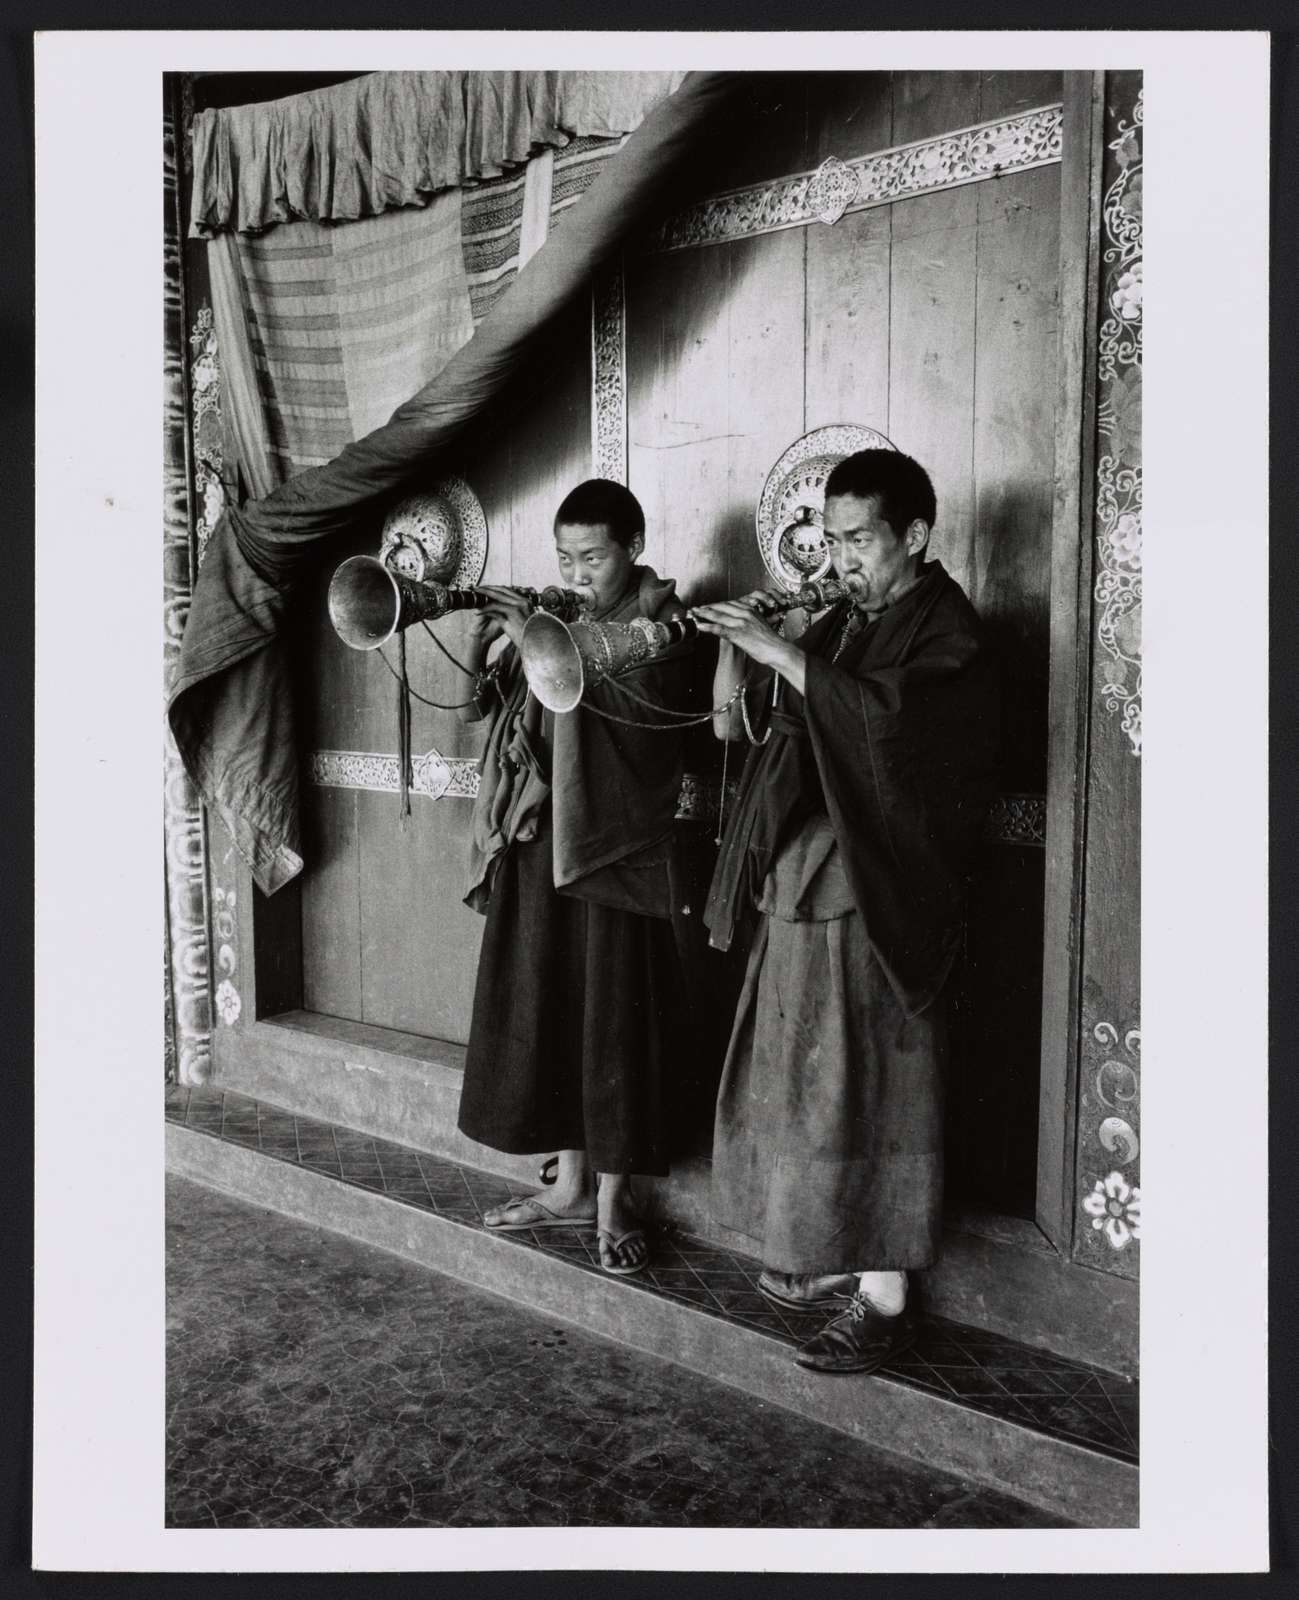 [Lamas blowing gyalings at temple door, Sikkim]